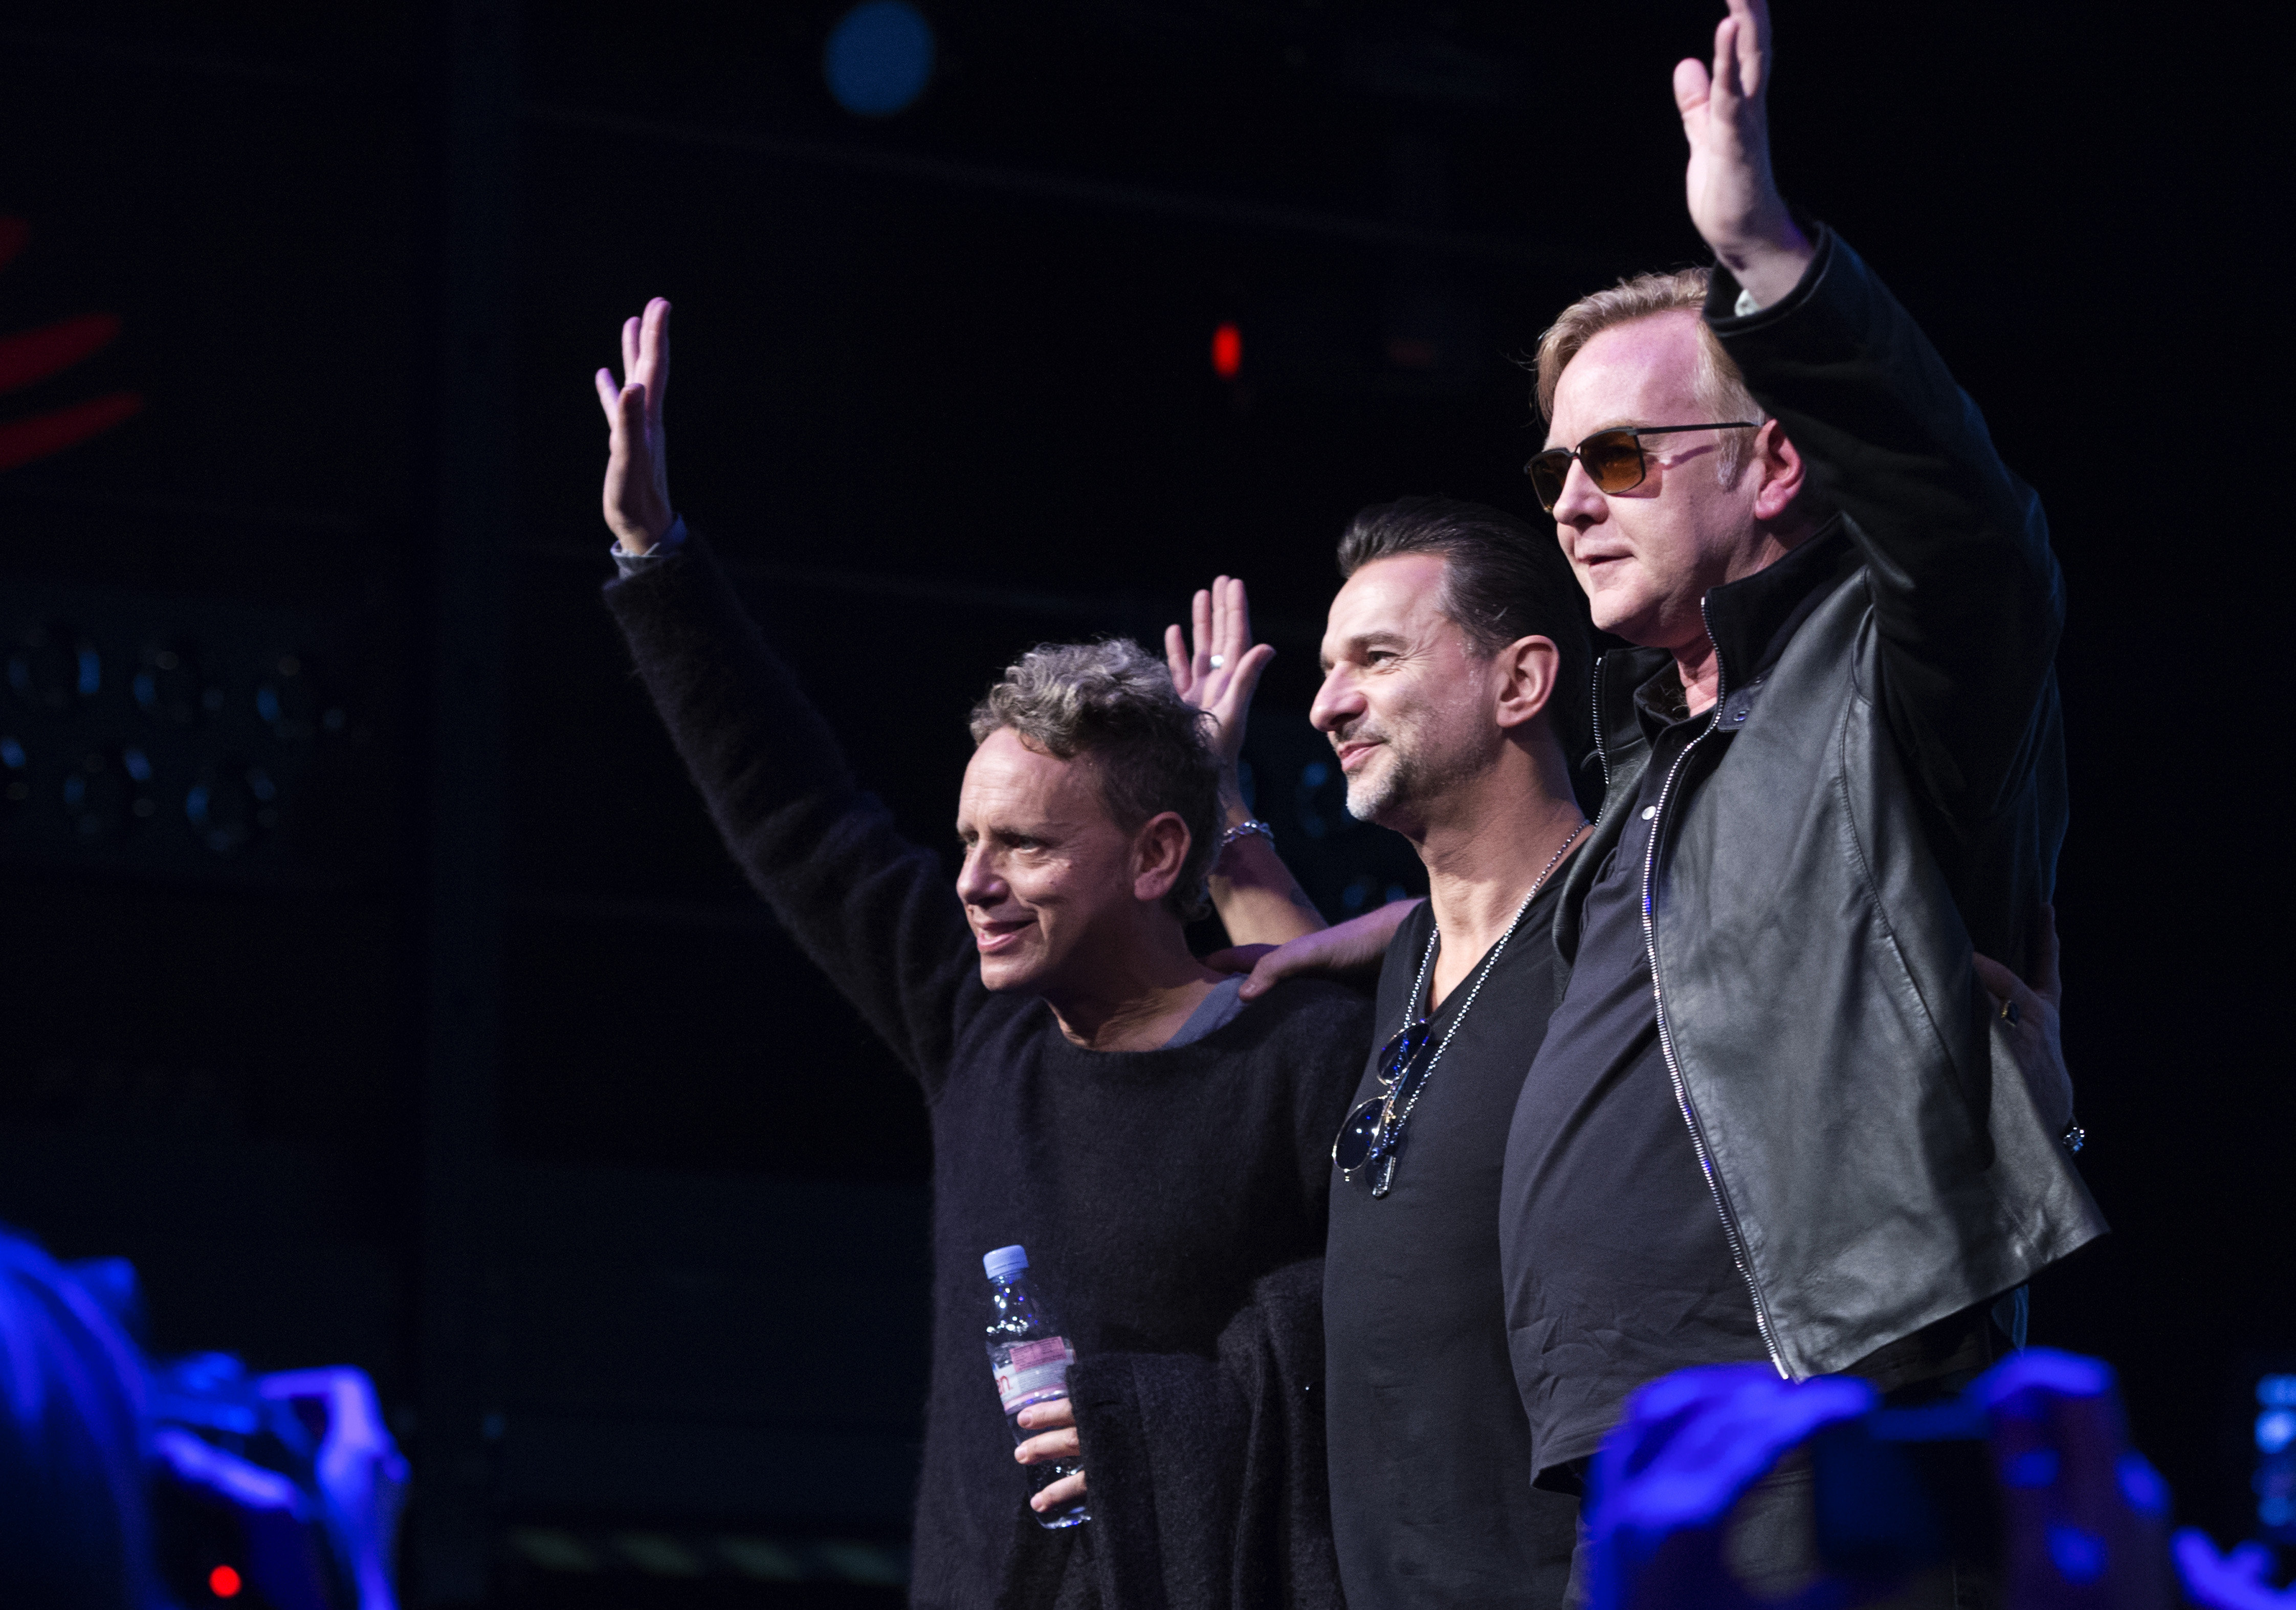 Depeche Mode Wallpapers Hd